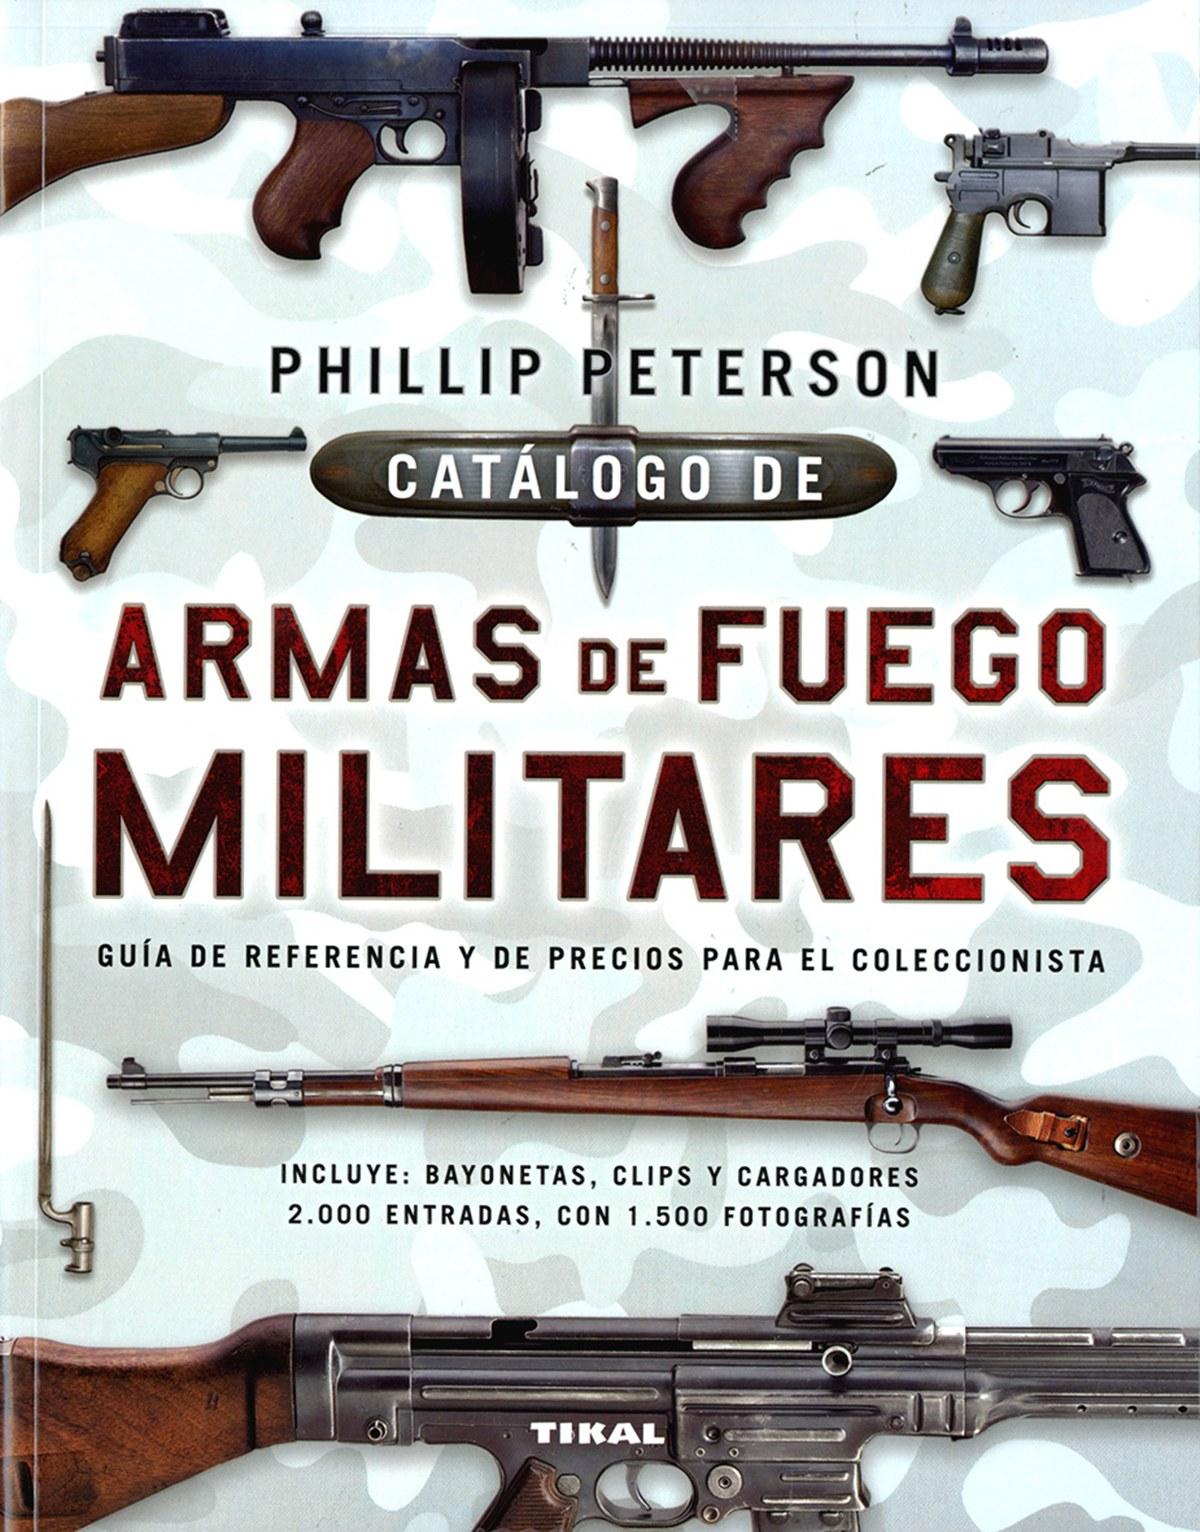 CATÁLOGO DE ARMAS DE FUEGO MILITARES 9788499284545